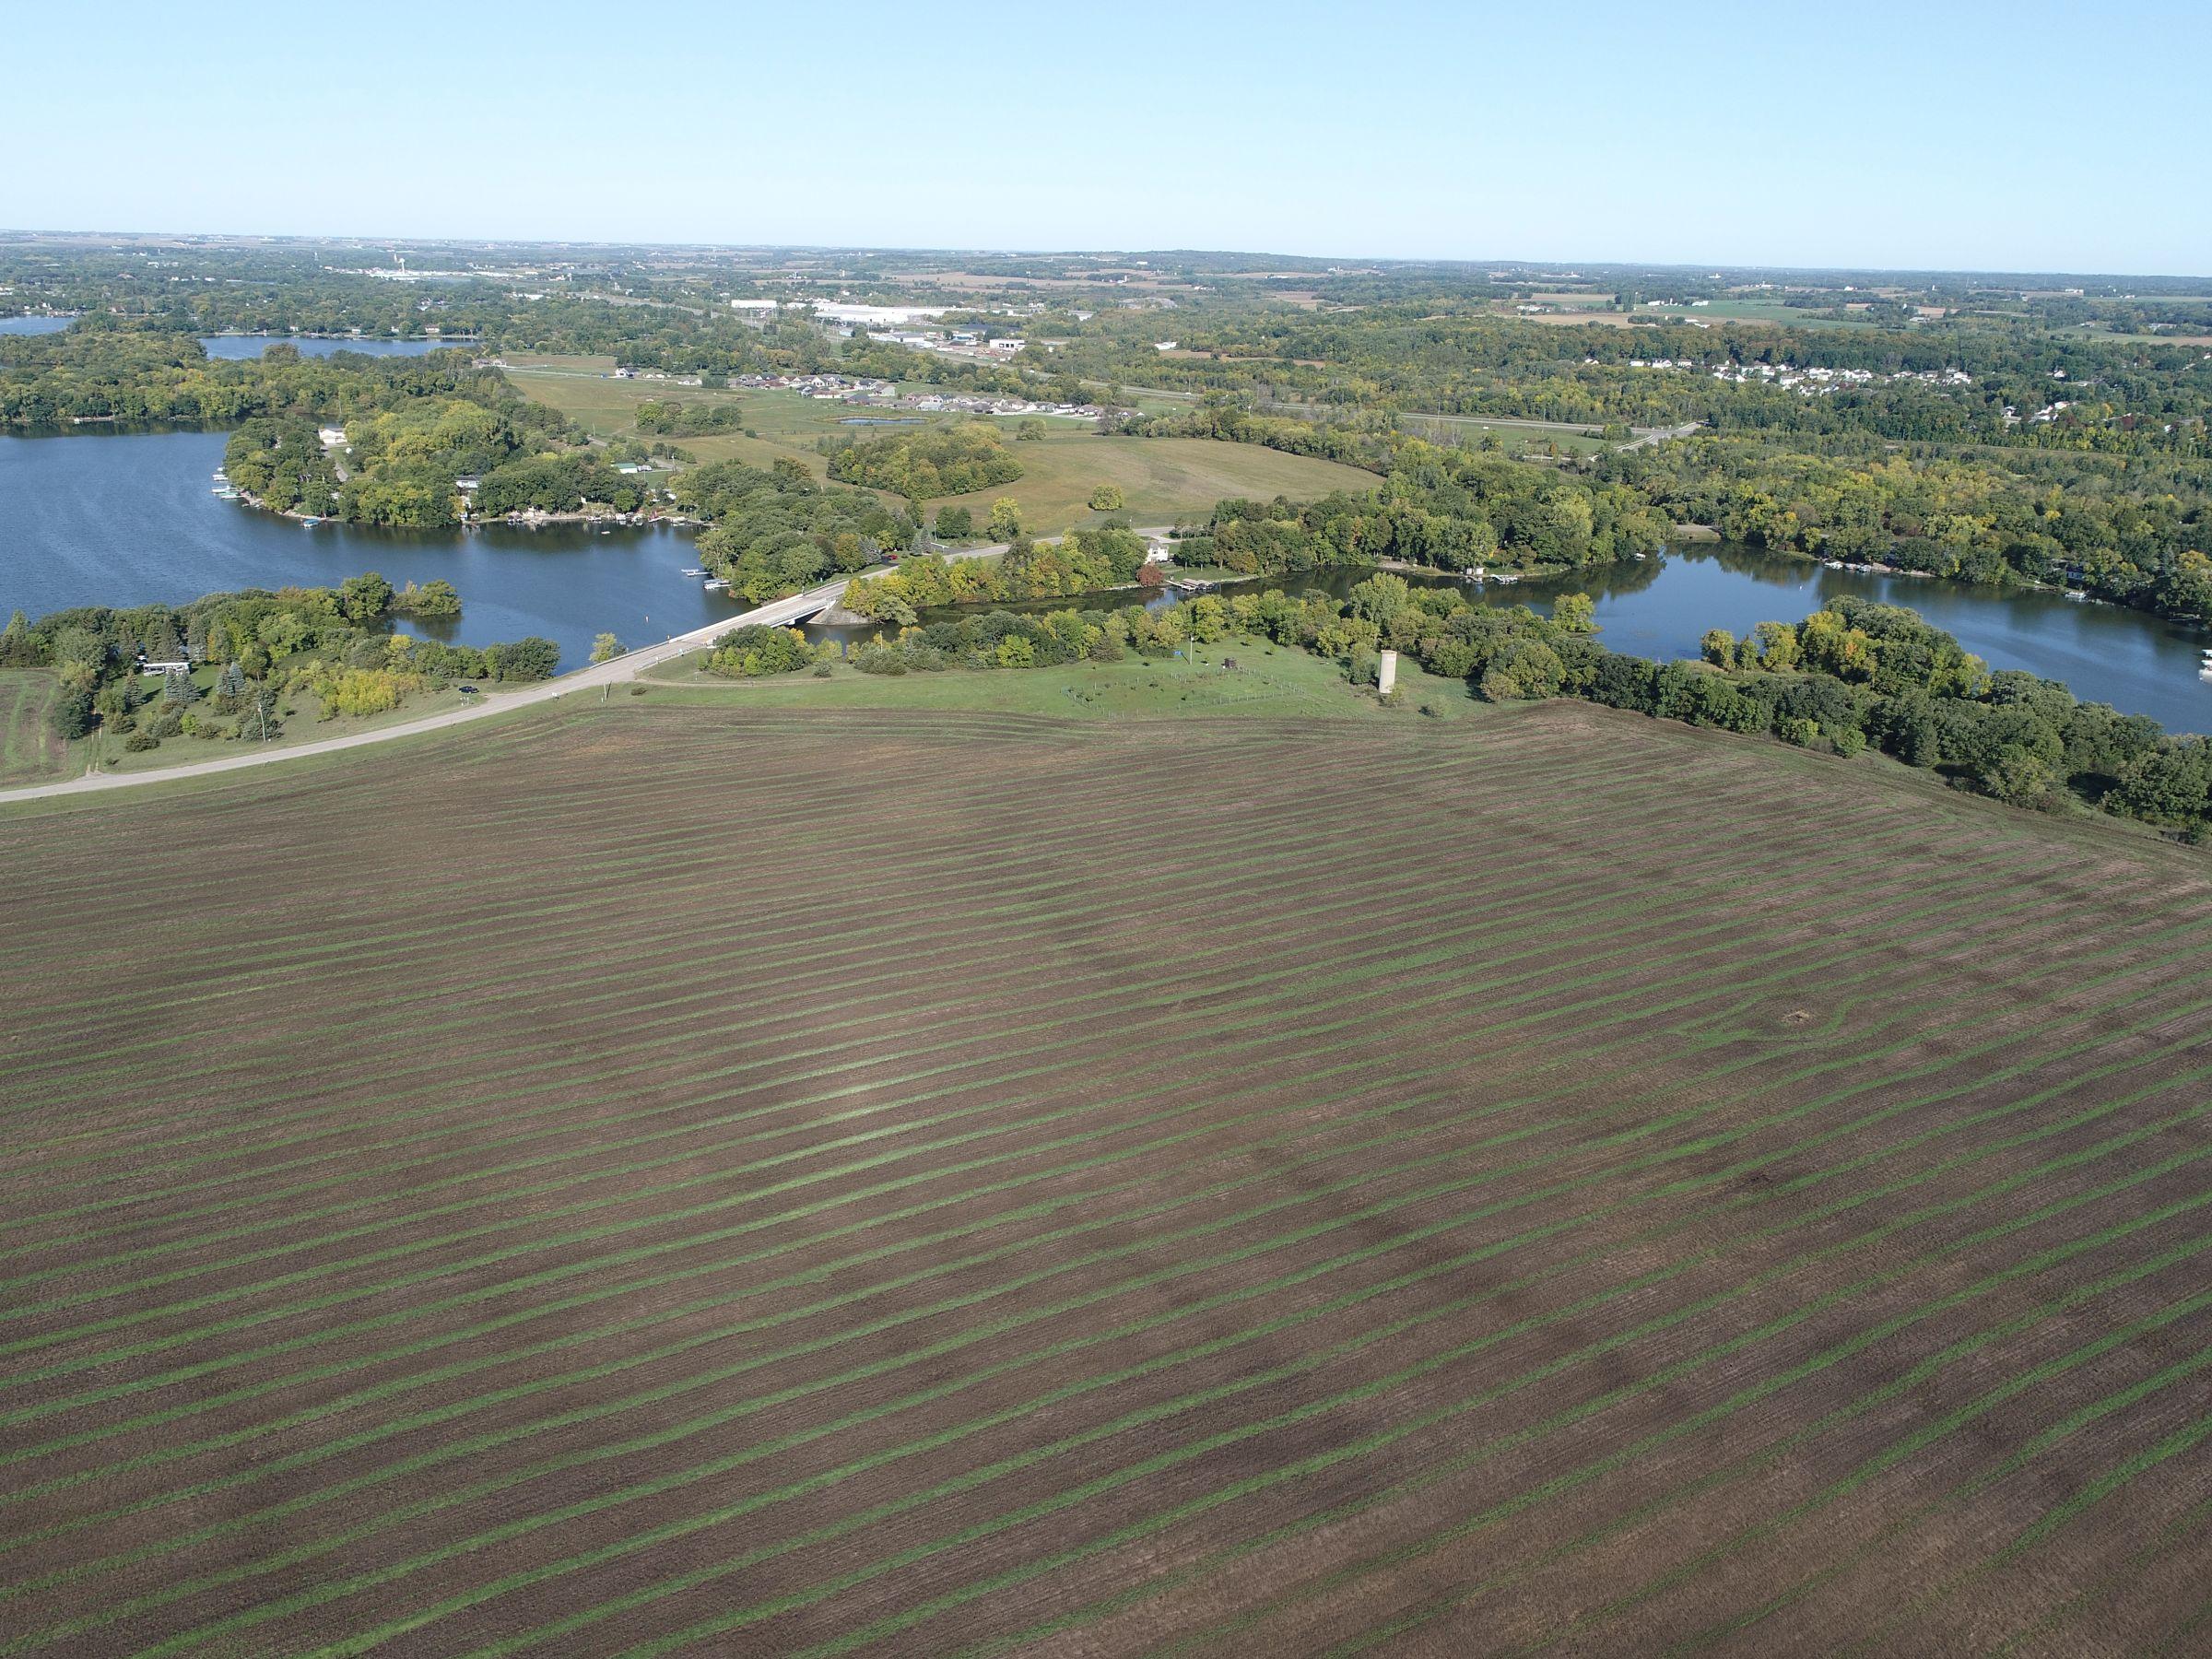 land-stearns-county-minnesota-298-acres-listing-number-15712-1-2021-09-23-123658.JPG